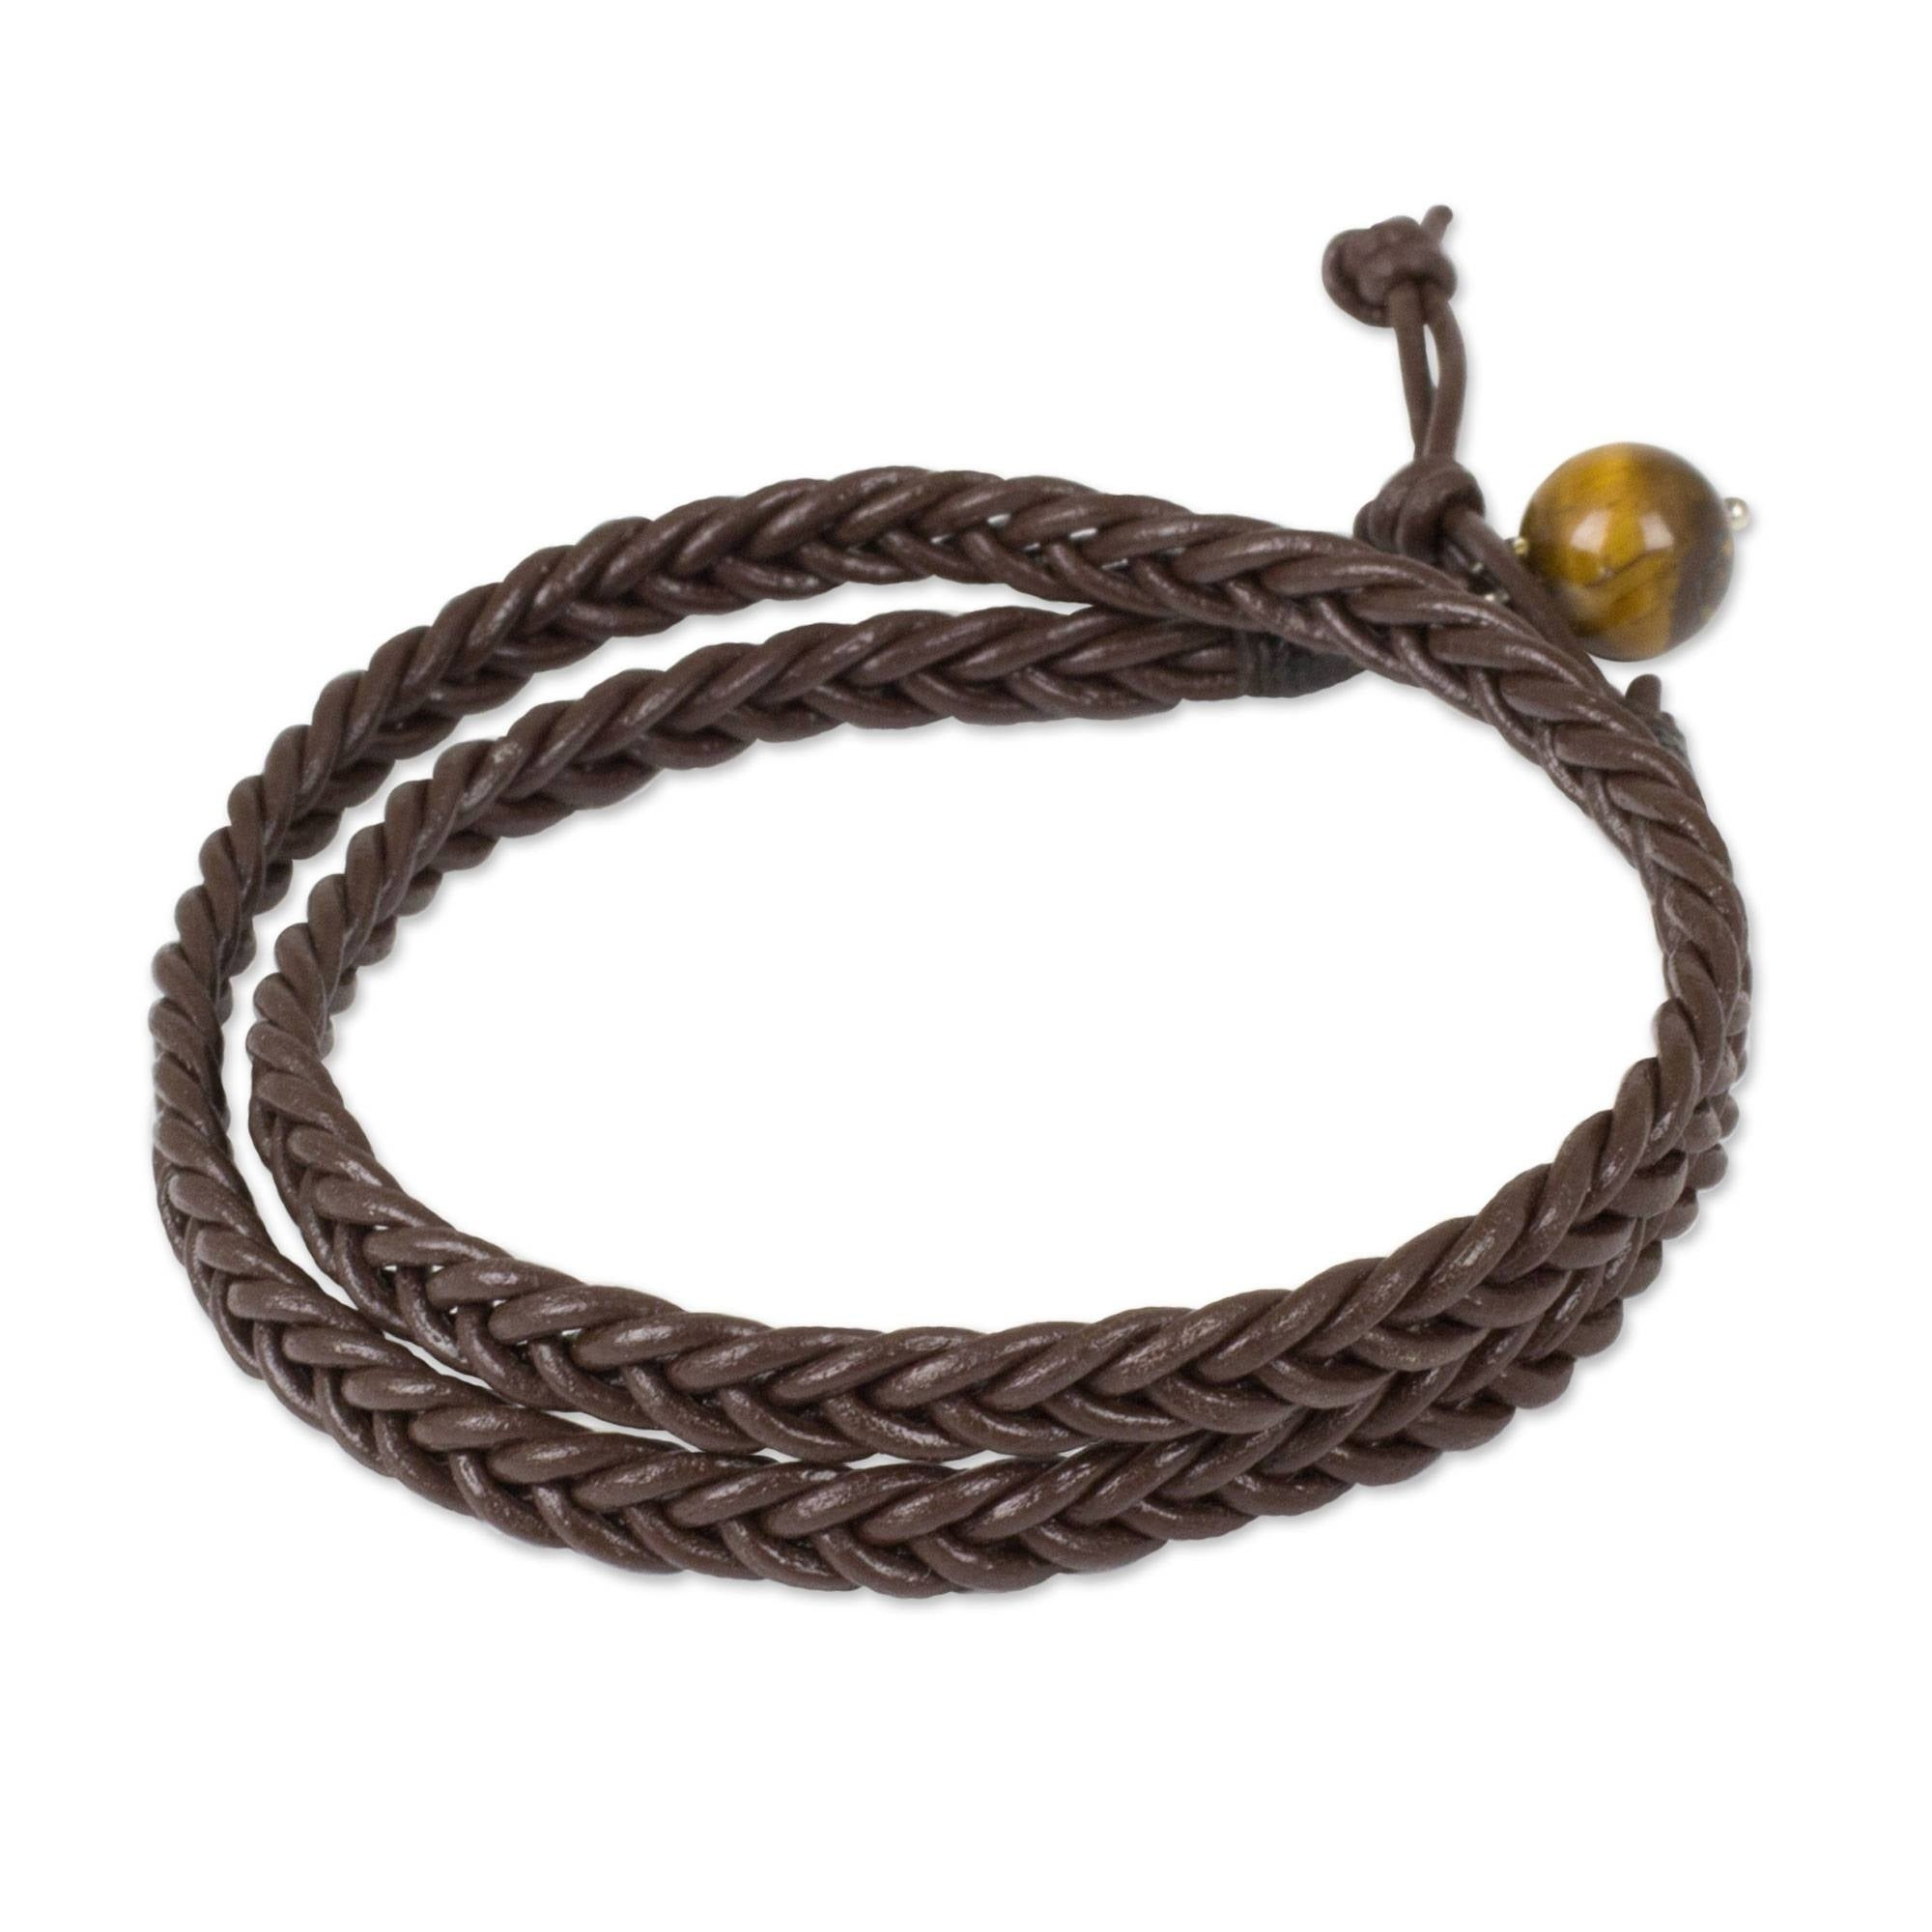 Plaited Black Leather Strap Bracelet Wristband Wraps Around The Wrist Twice Gift